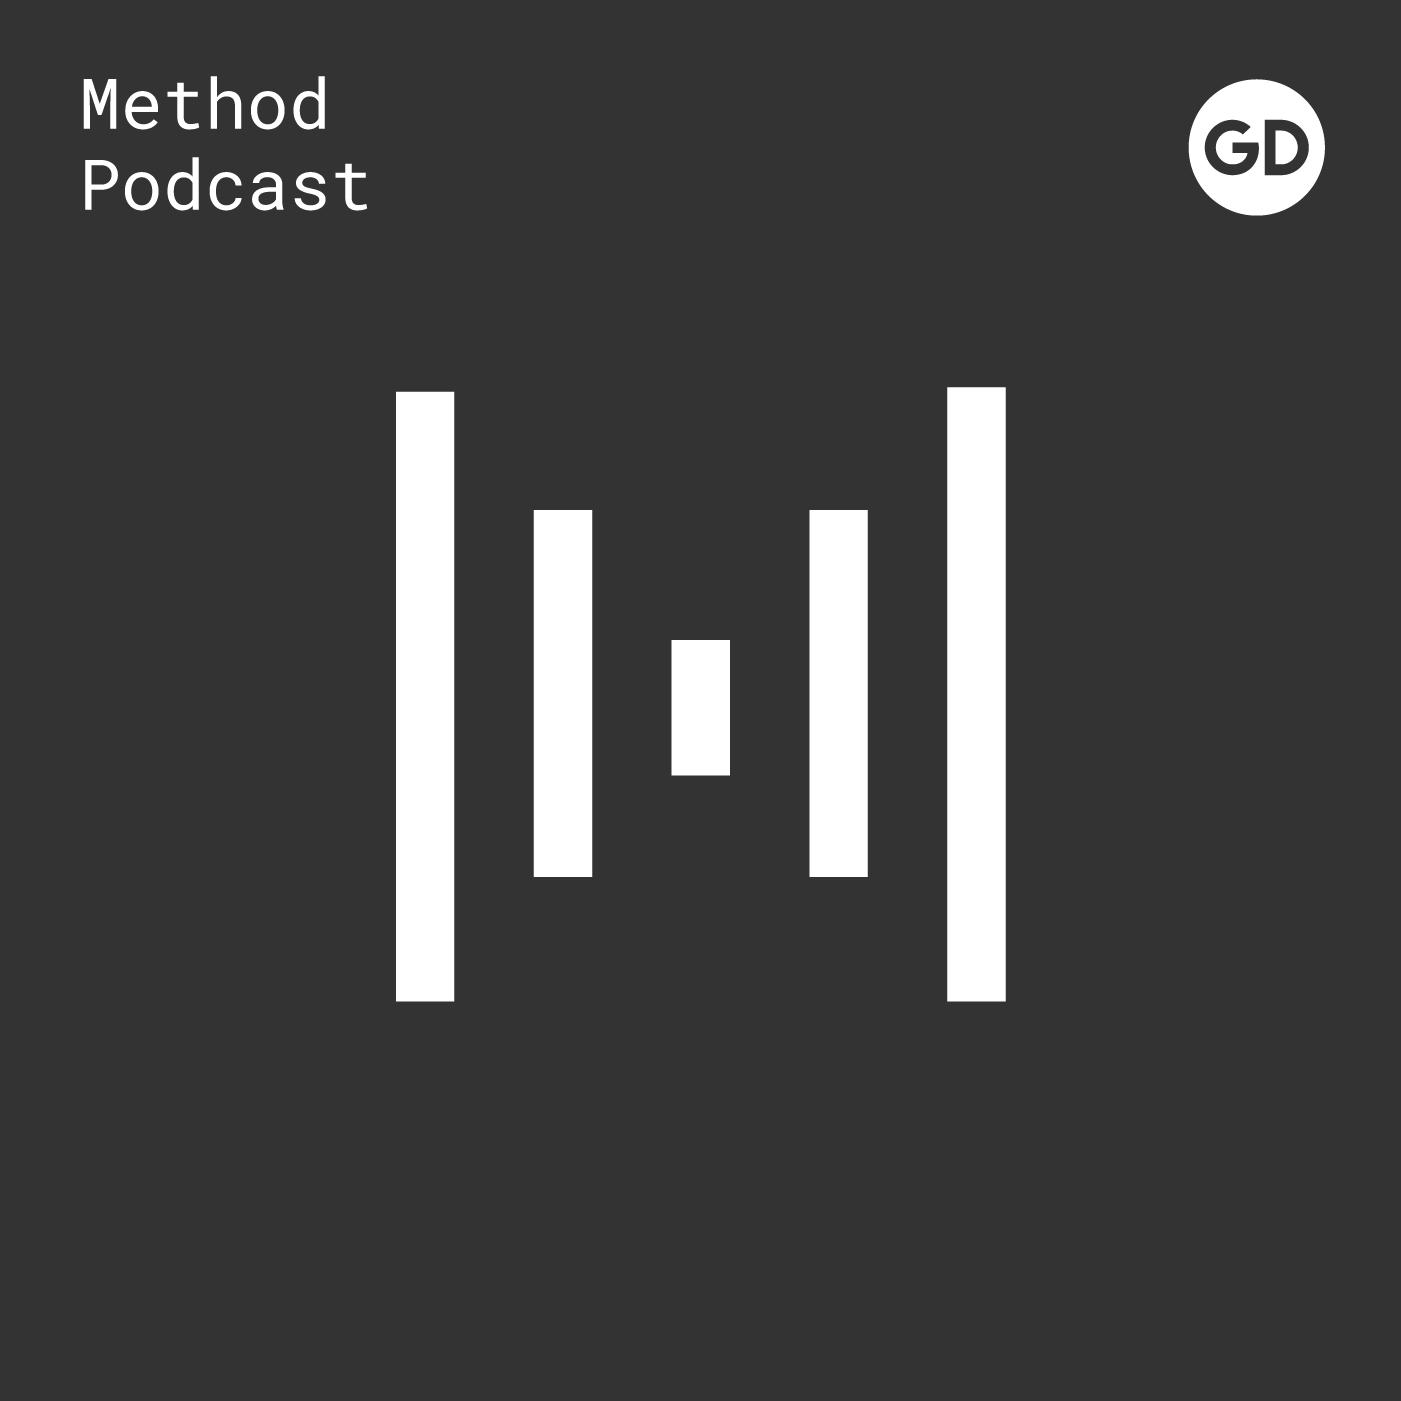 Method Podcast from Google Design show art